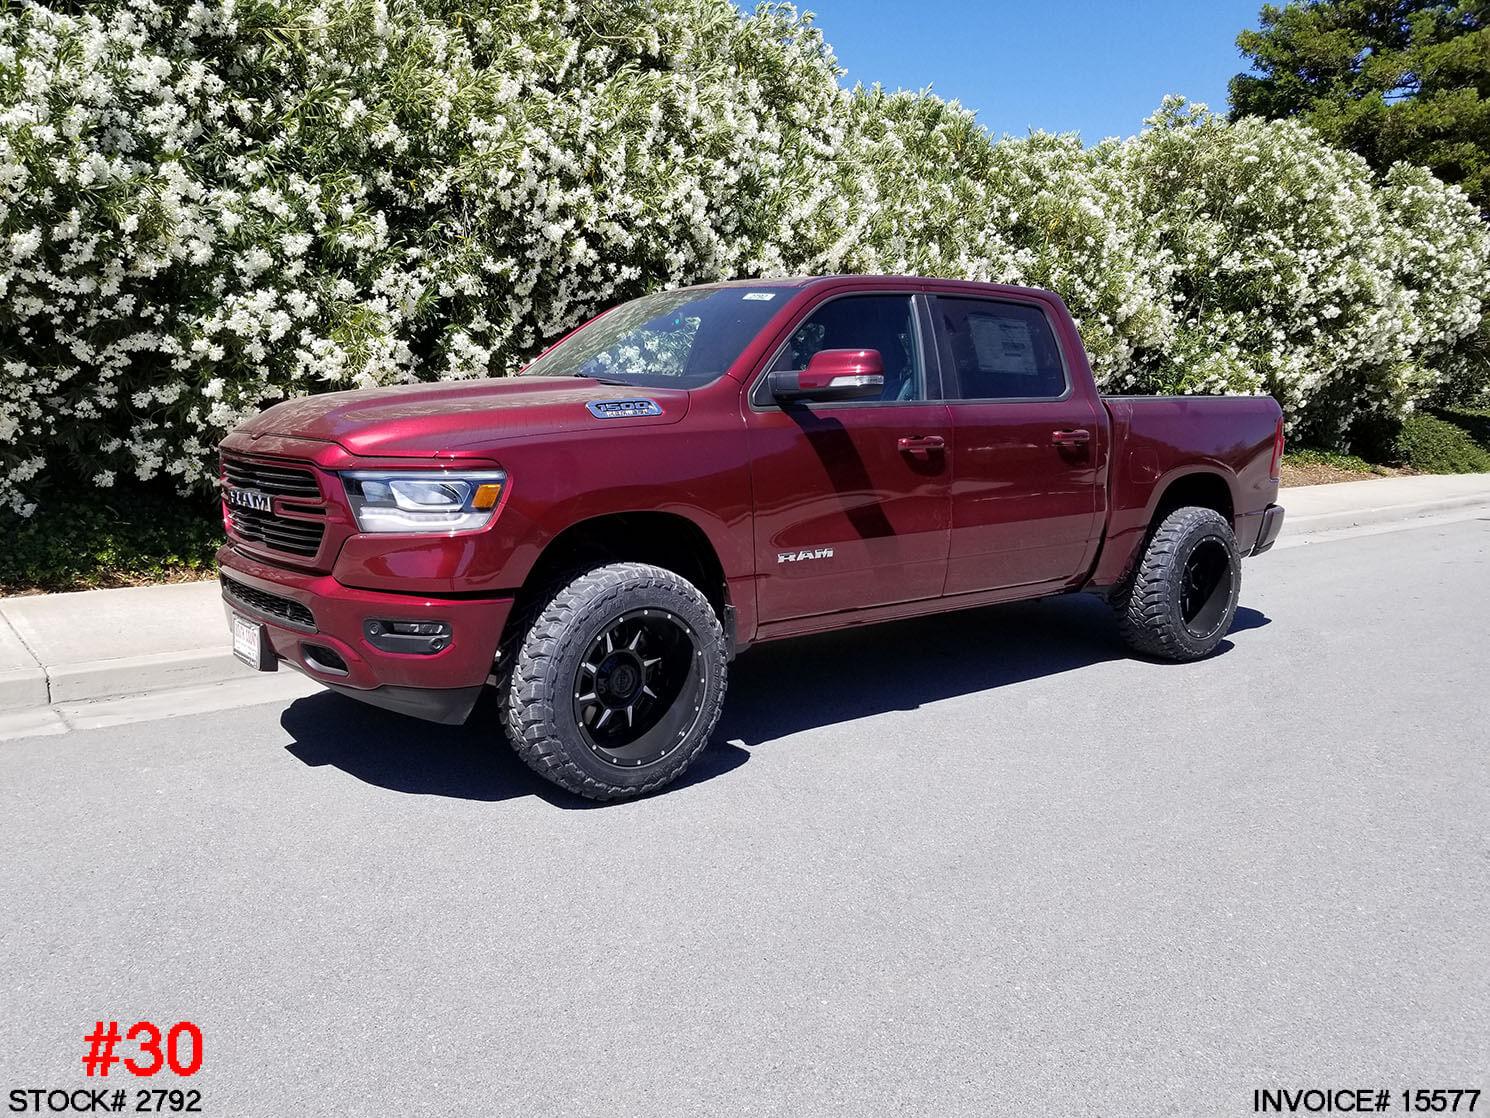 2019 DODGE RAM 1500 CREW CAB #2792 | Truck and SUV Parts